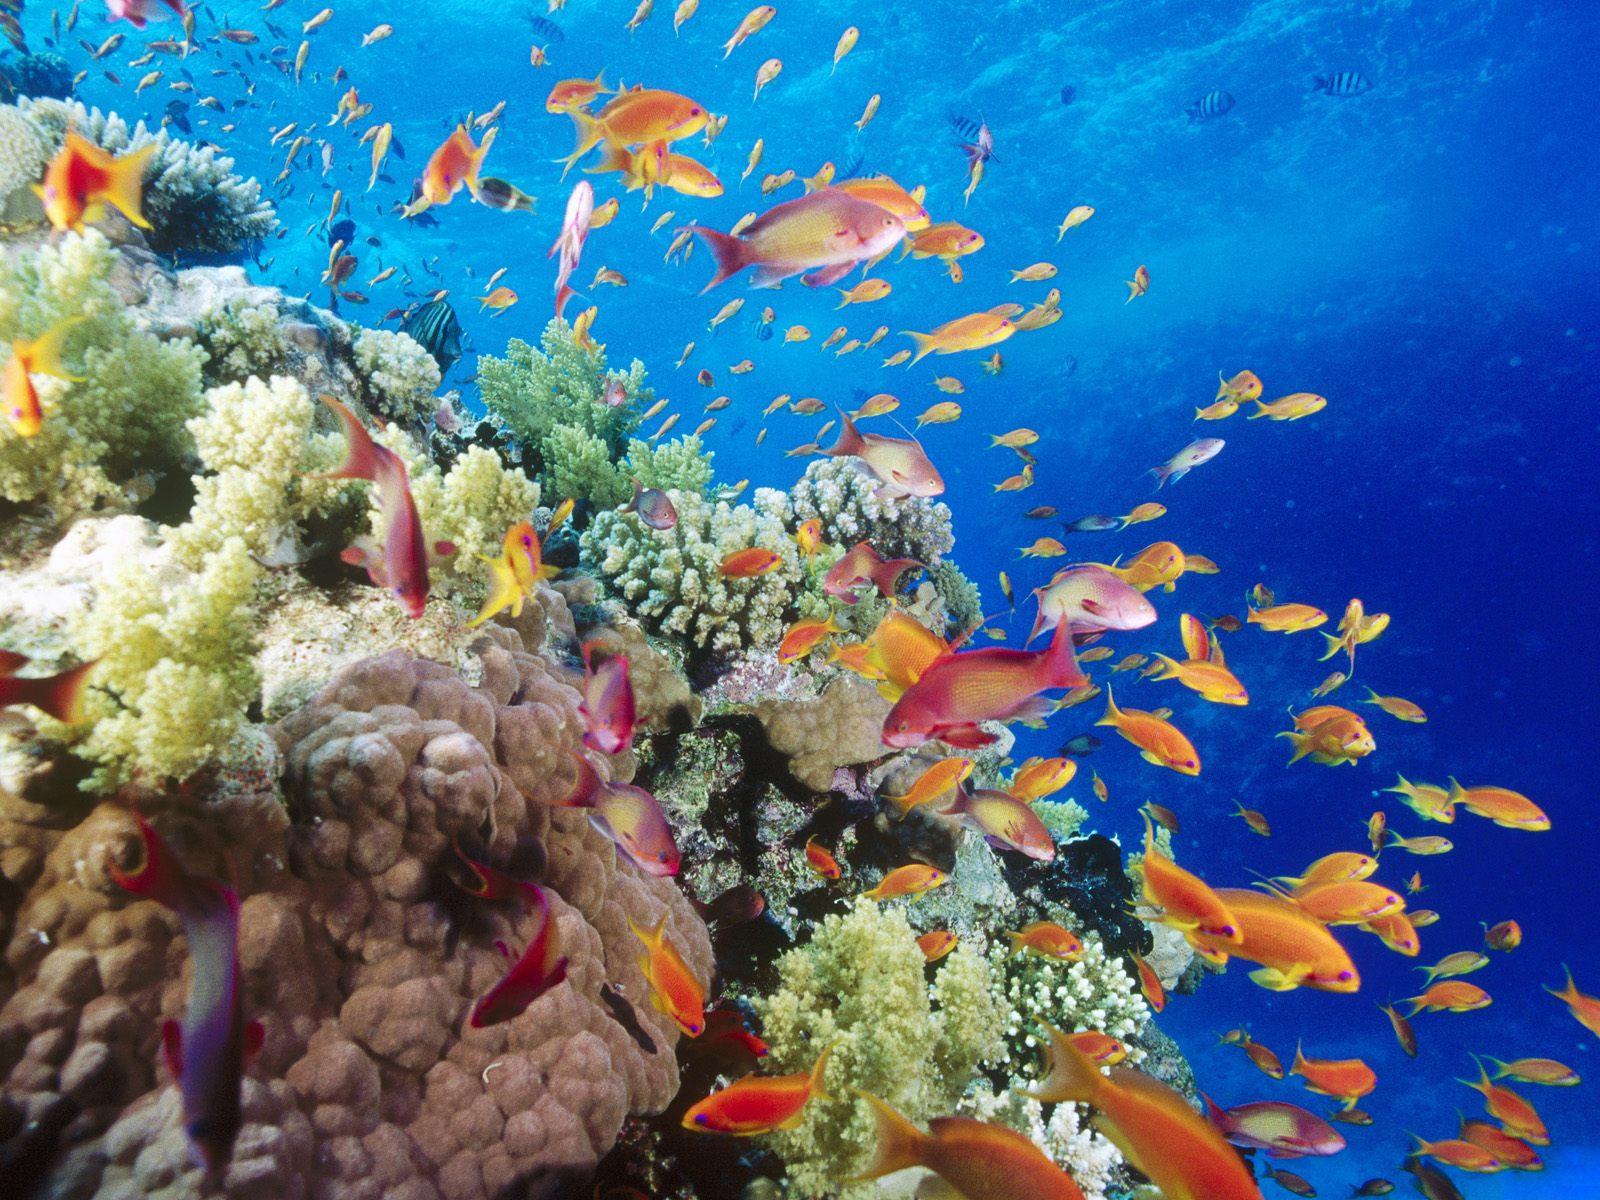 http://1.bp.blogspot.com/-ZaWoUON8lGk/TkrShcjEKHI/AAAAAAAALk0/EJMAVWkyLHs/s1600/Underwater%20Wallpapers%20%2825%29.jpg